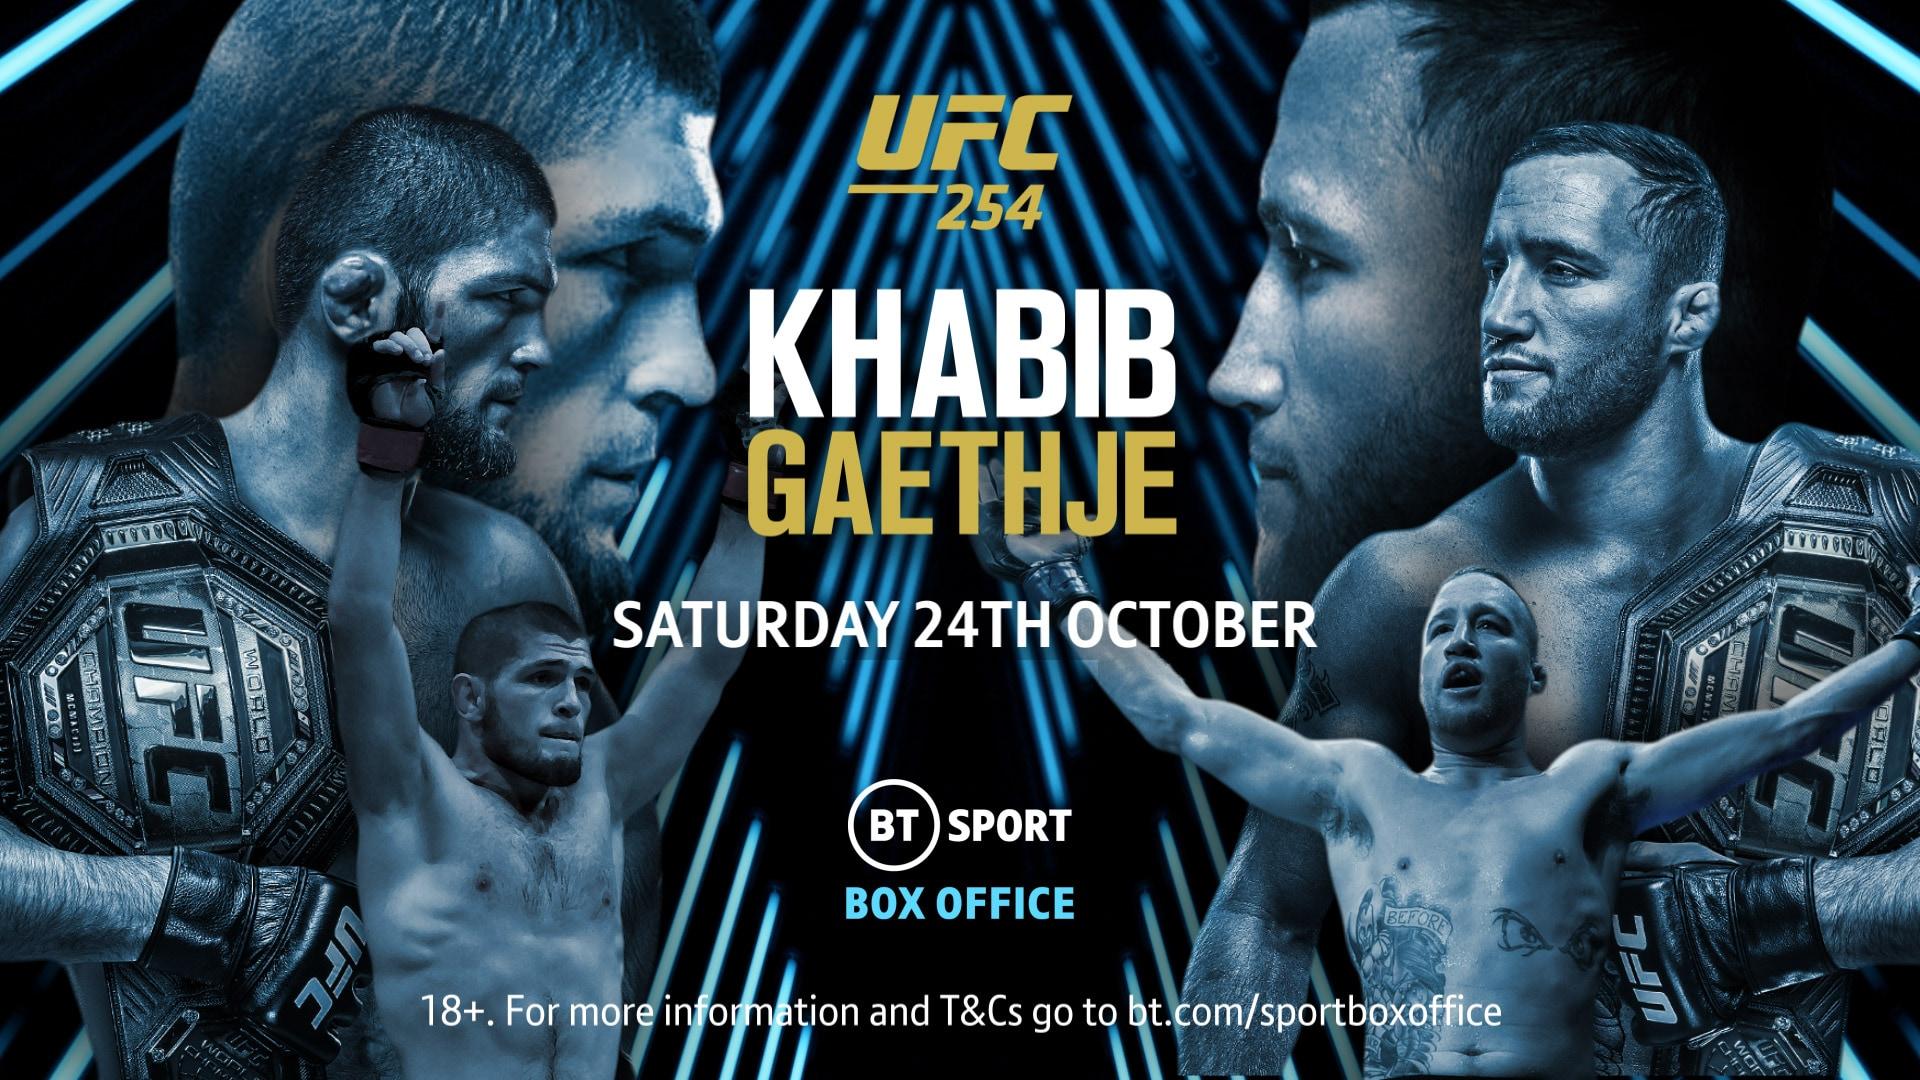 UFC 254: Khabib v Gaethje on BT Sport Box Office